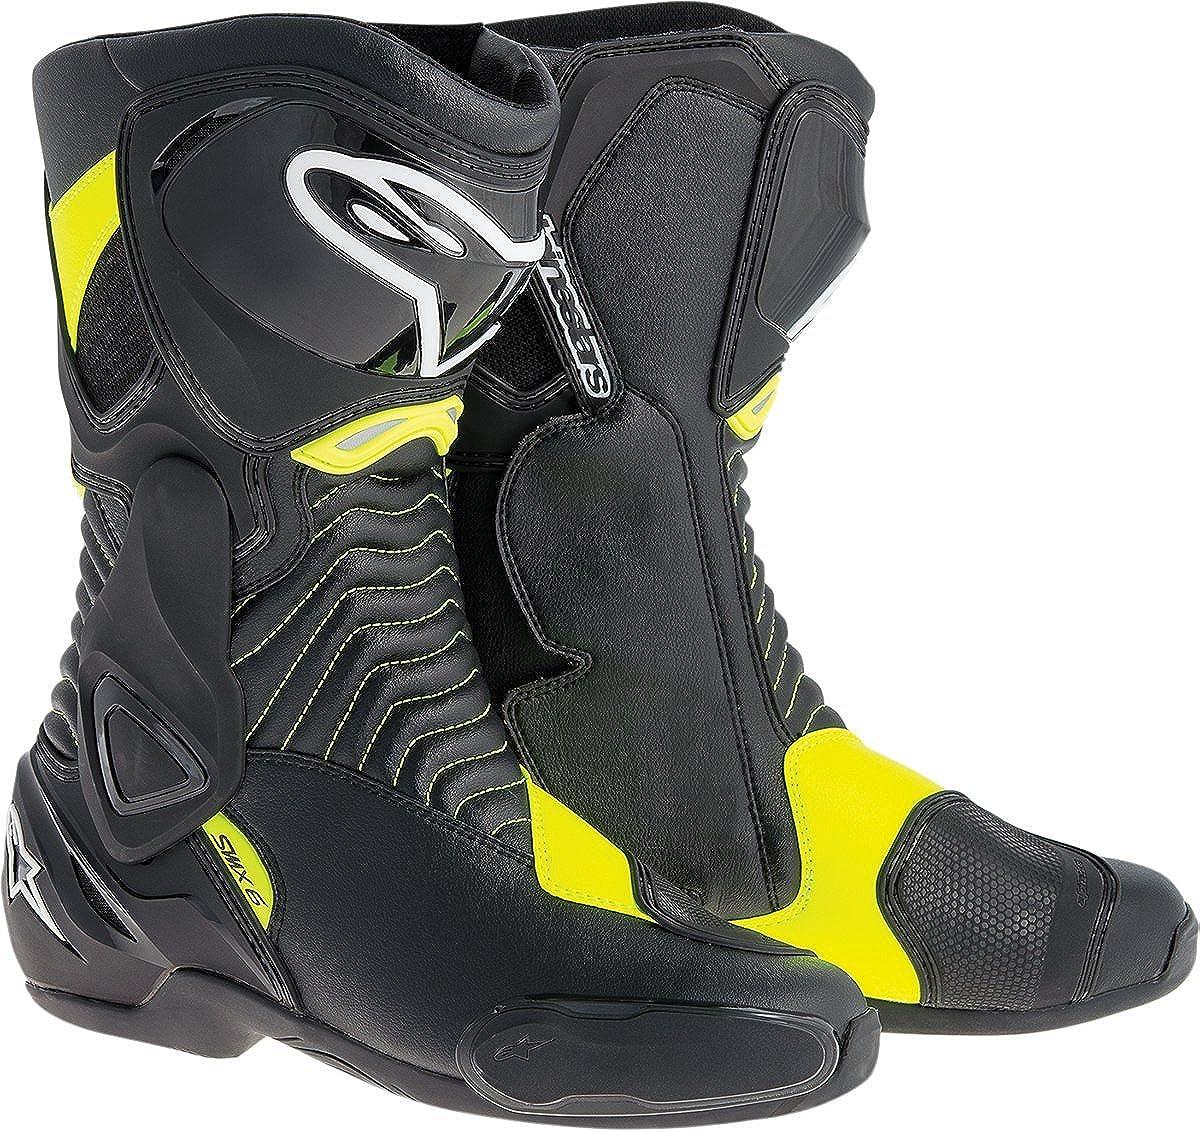 Alpinestars SMX-6 Men's Soldering Boots Motorcycle Super sale period limited Street